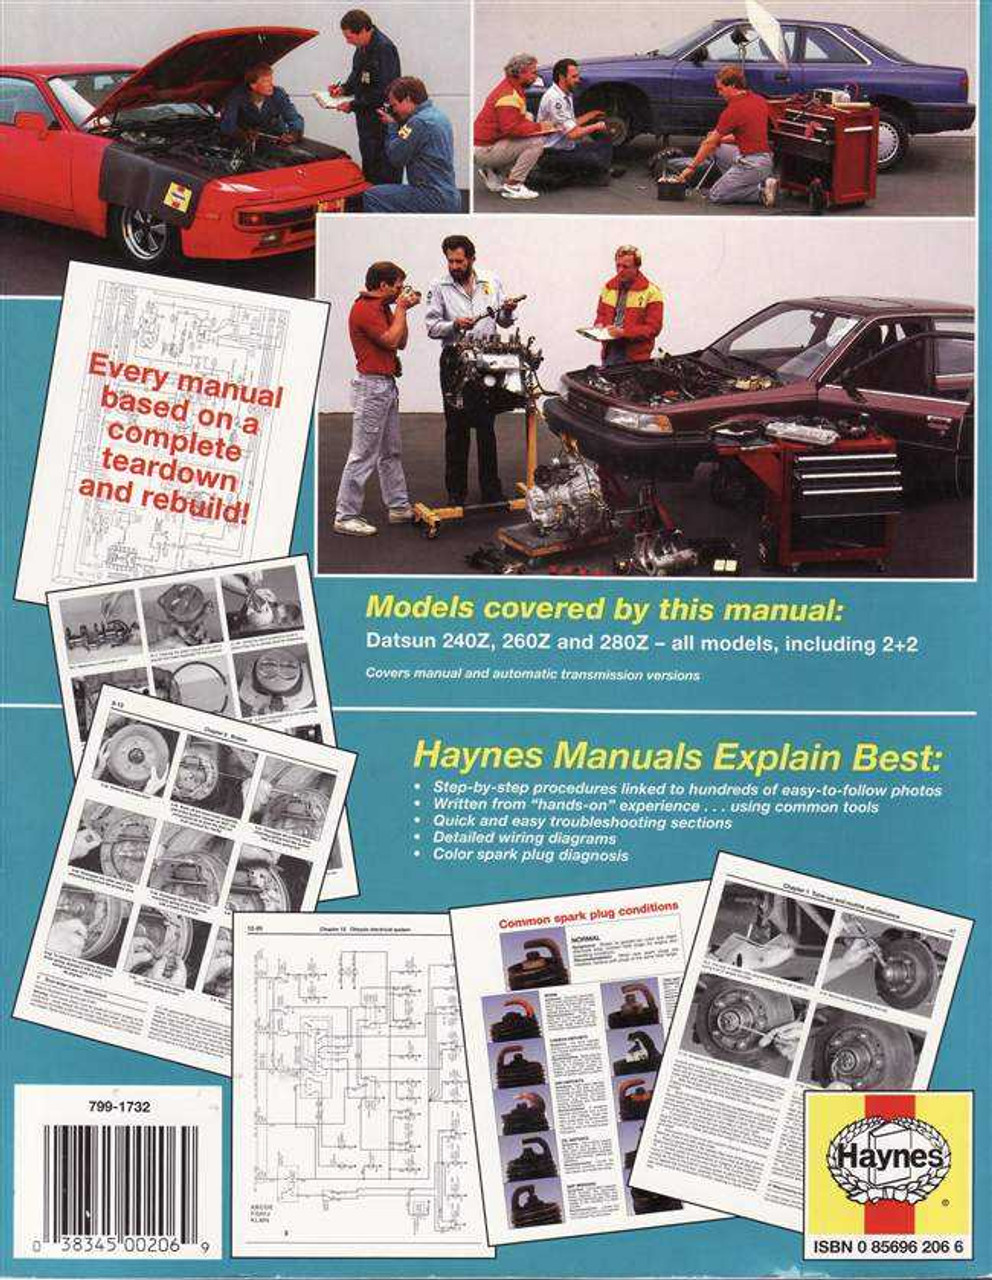 Nissan Datsun 240Z, 260Z and 280Z 1970 - 1978 Workshop Manual on nissan engine diagram, nissan suspension diagram, nissan battery diagram, nissan transaxle, nissan repair diagrams, nissan ignition resistor, nissan diesel conversion, nissan fuel system diagram, nissan brakes diagram, nissan radiator diagram, nissan distributor diagram, nissan schematic diagram, nissan main fuse, nissan electrical diagrams, nissan repair guide, nissan body diagram, nissan wire harness diagram, nissan fuel pump, nissan chassis diagram, nissan ignition key,